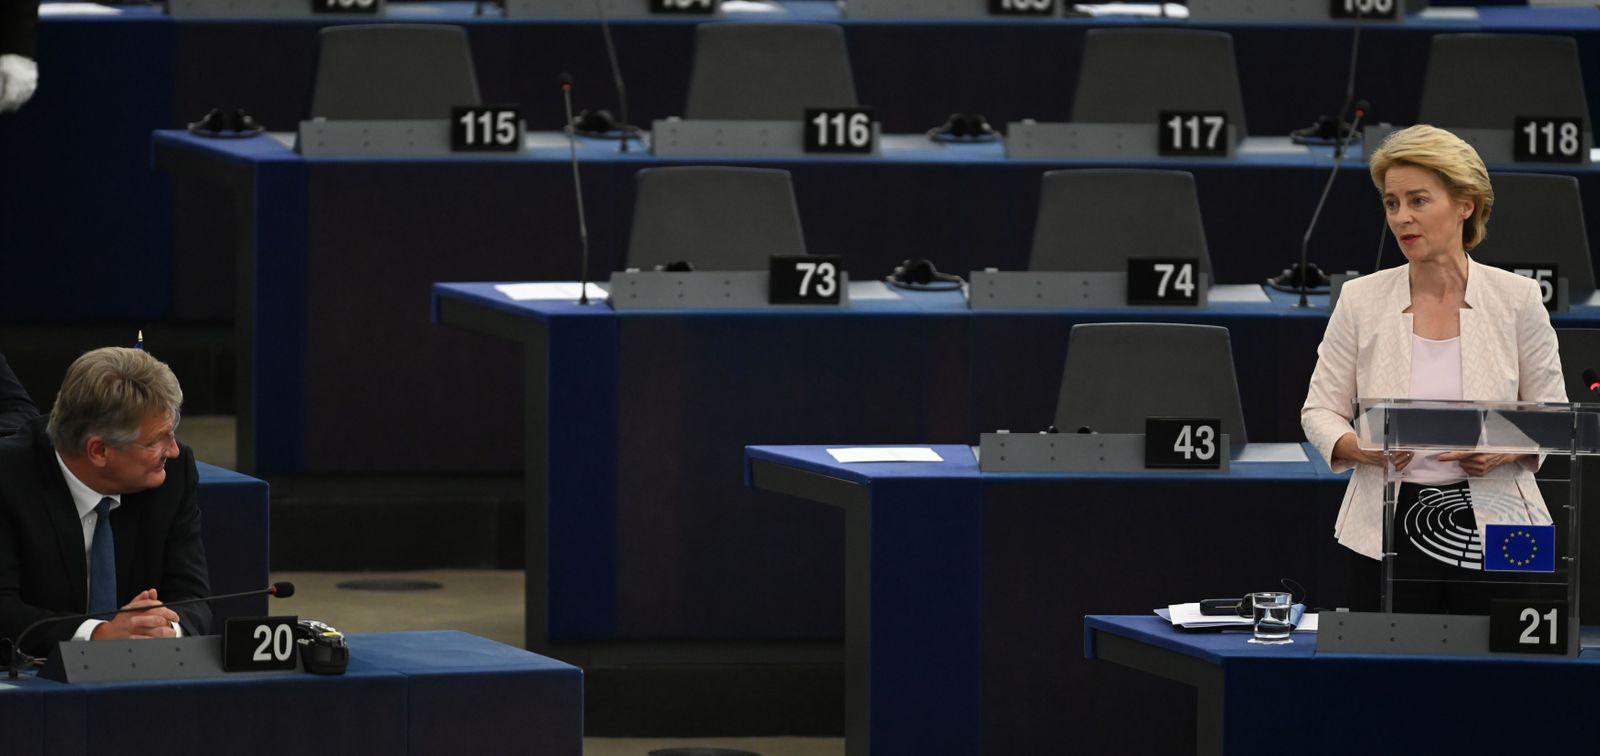 European Parliament in Strasbourg, France - 16 Jul 2019